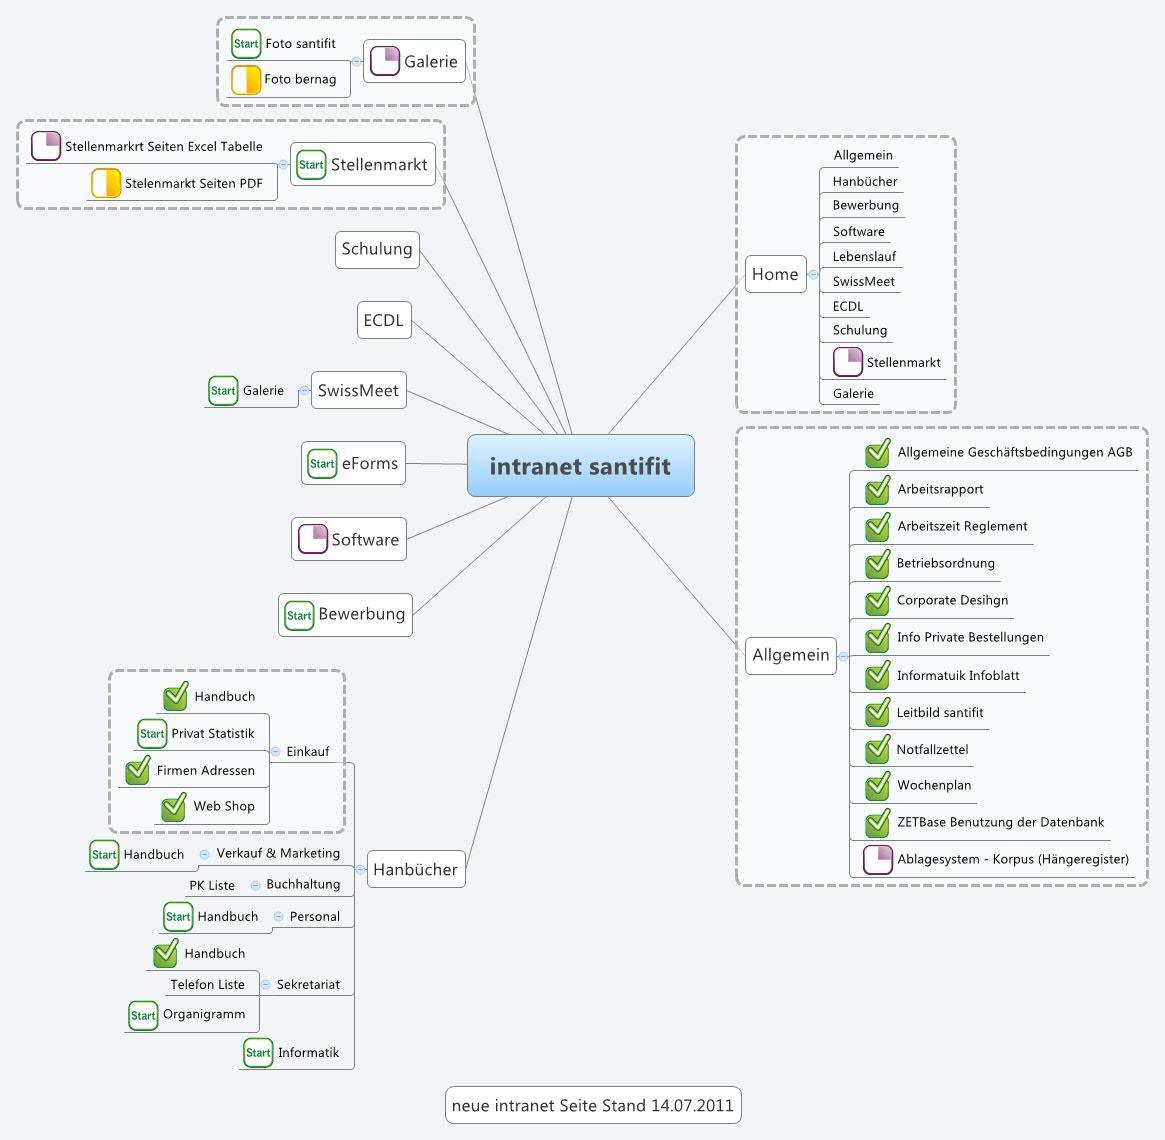 Intranet Santifit Xmind Mind Mapping Software Diagram